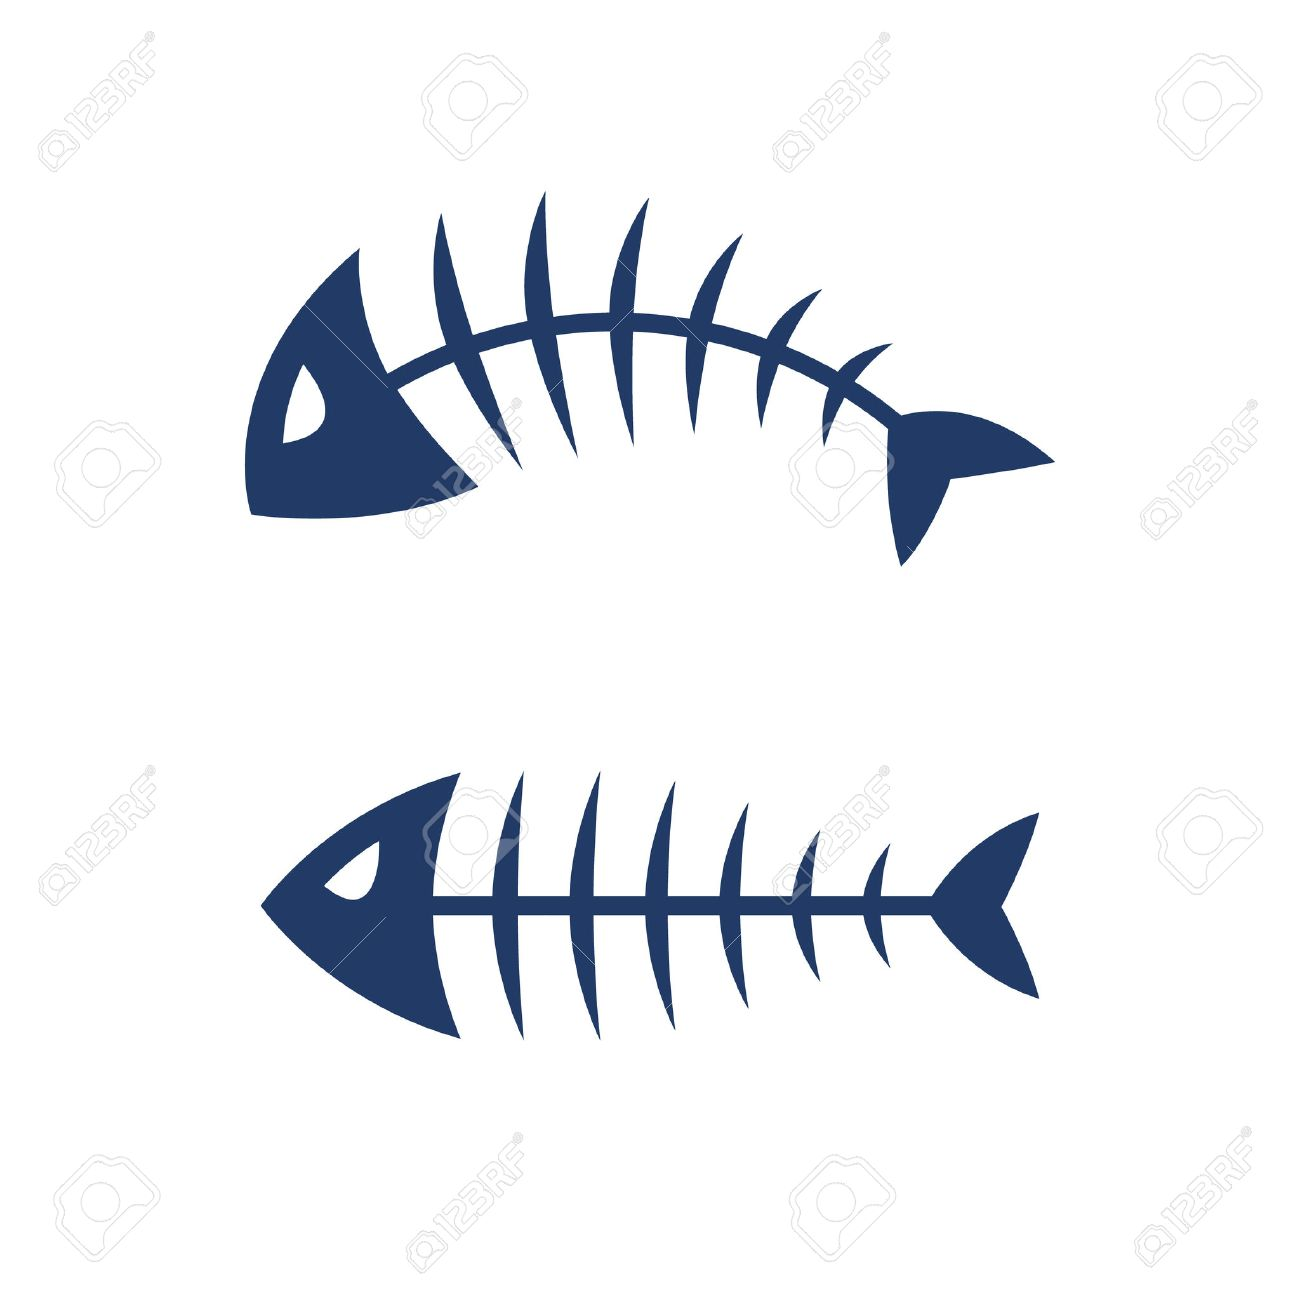 fish bone skeleton symbol vector icon design royalty free cliparts rh 123rf com skeleton fish logo restaurant fish skeleton logo jacket